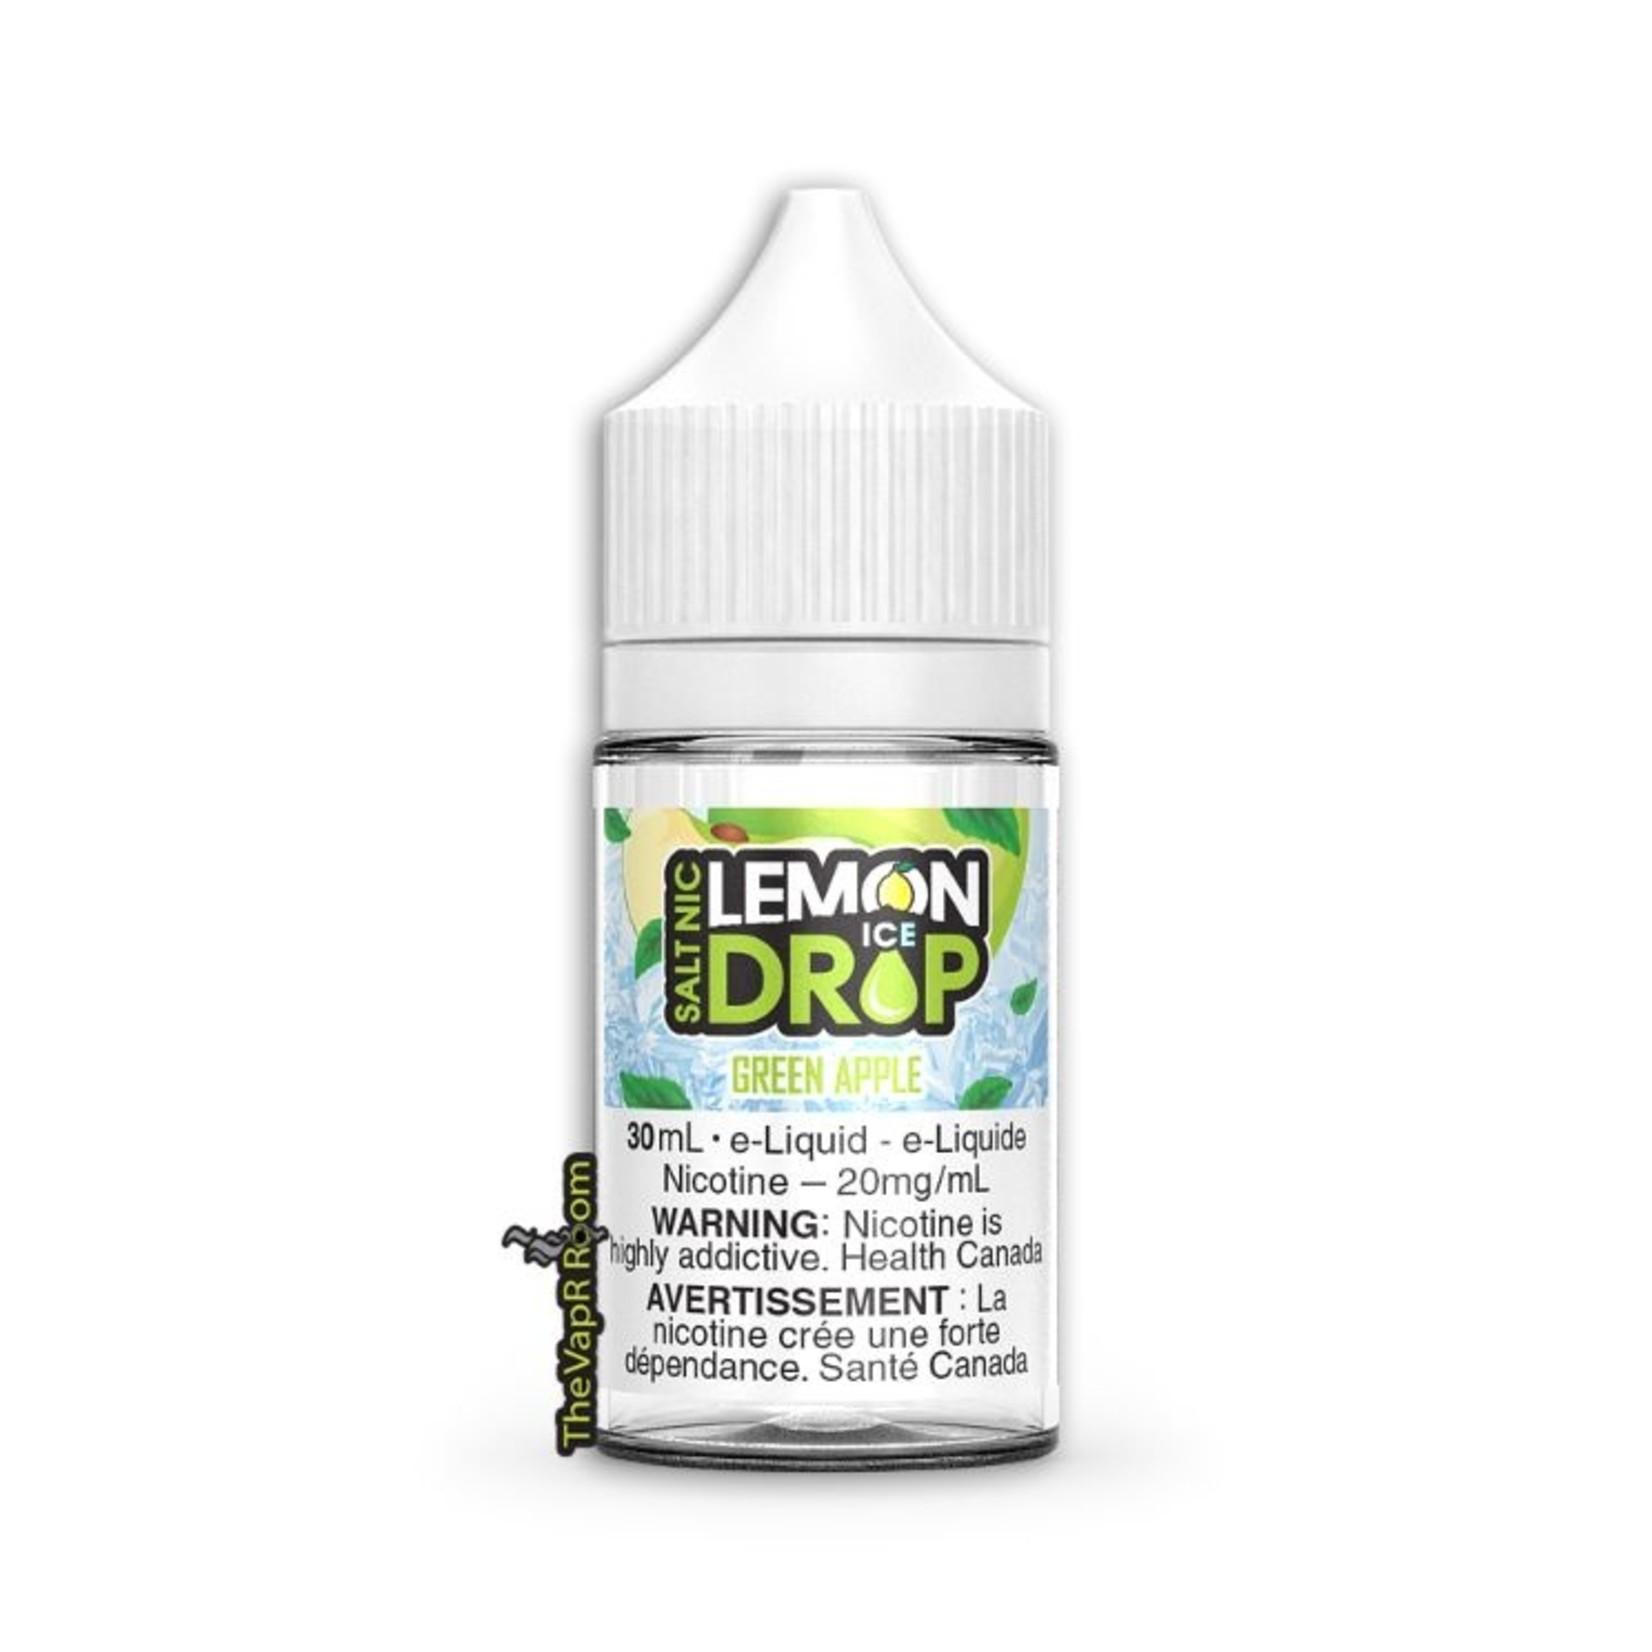 Iced Green Apple Salt - Lemon Drop